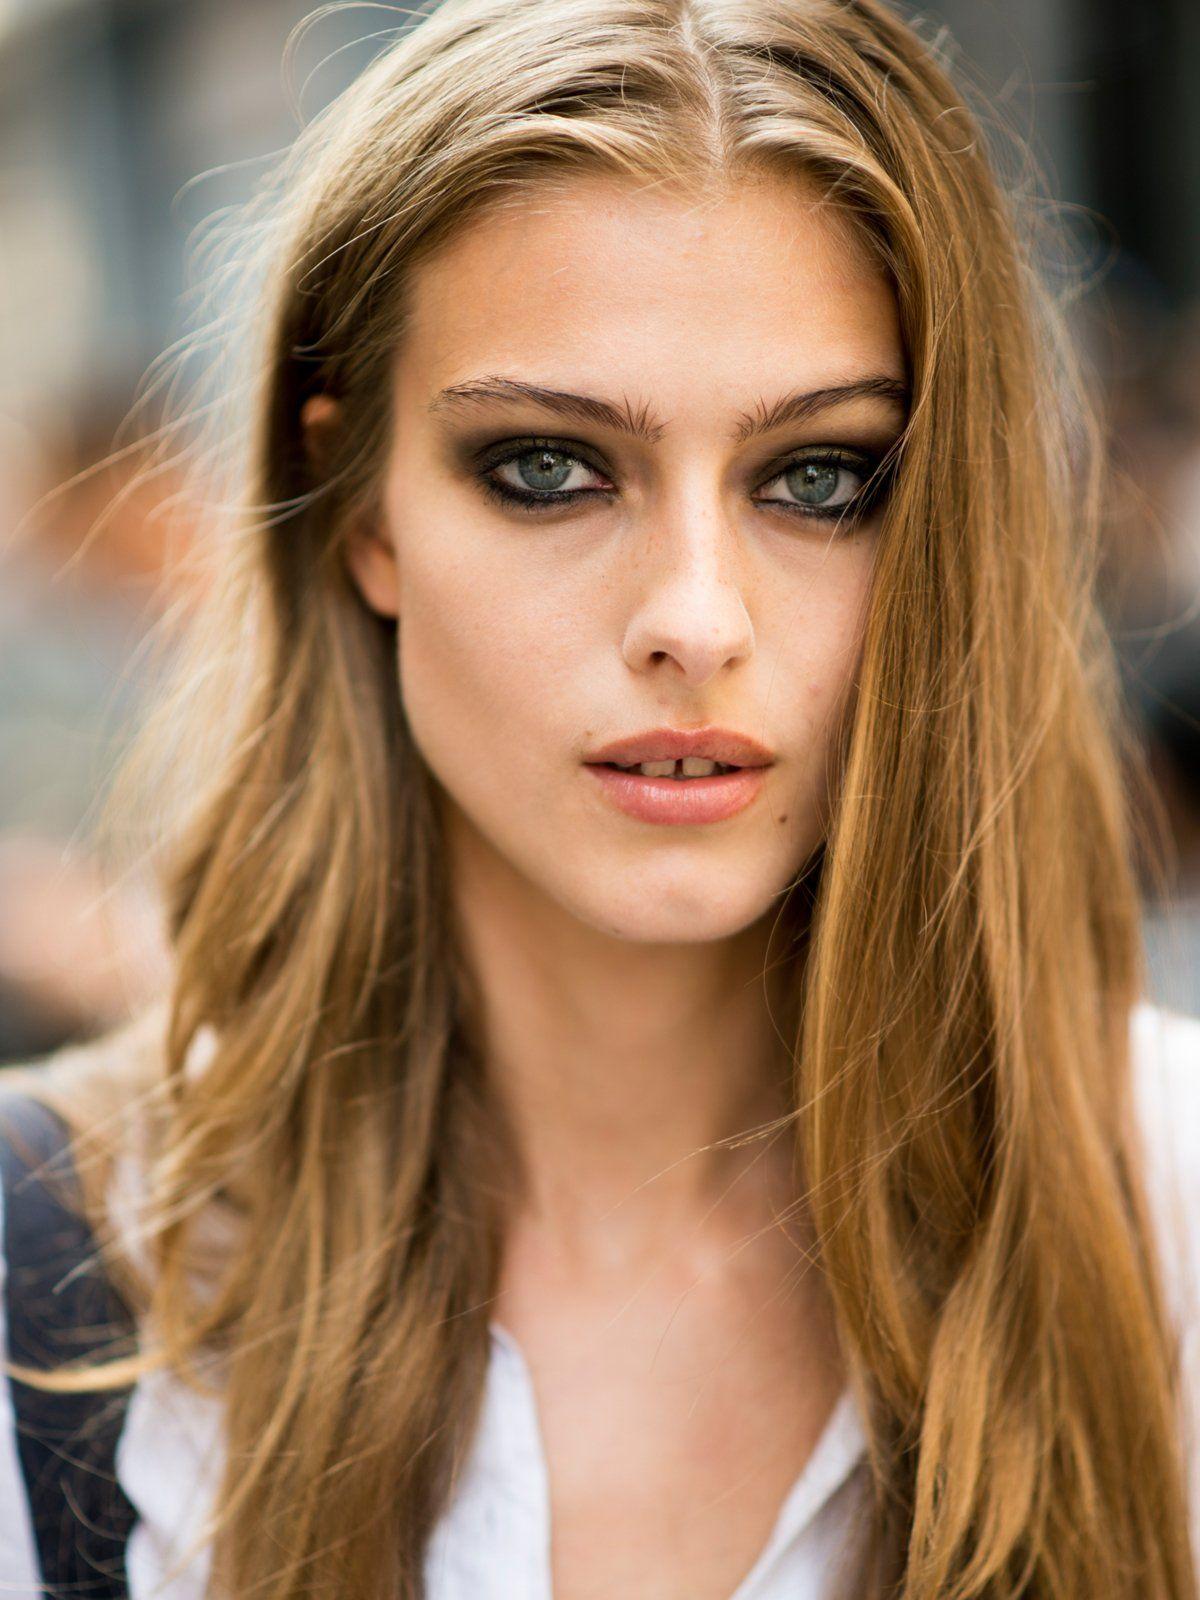 Karamell Haarfarbe | make-up | Beauty, Gorgeous hair, Hair ...